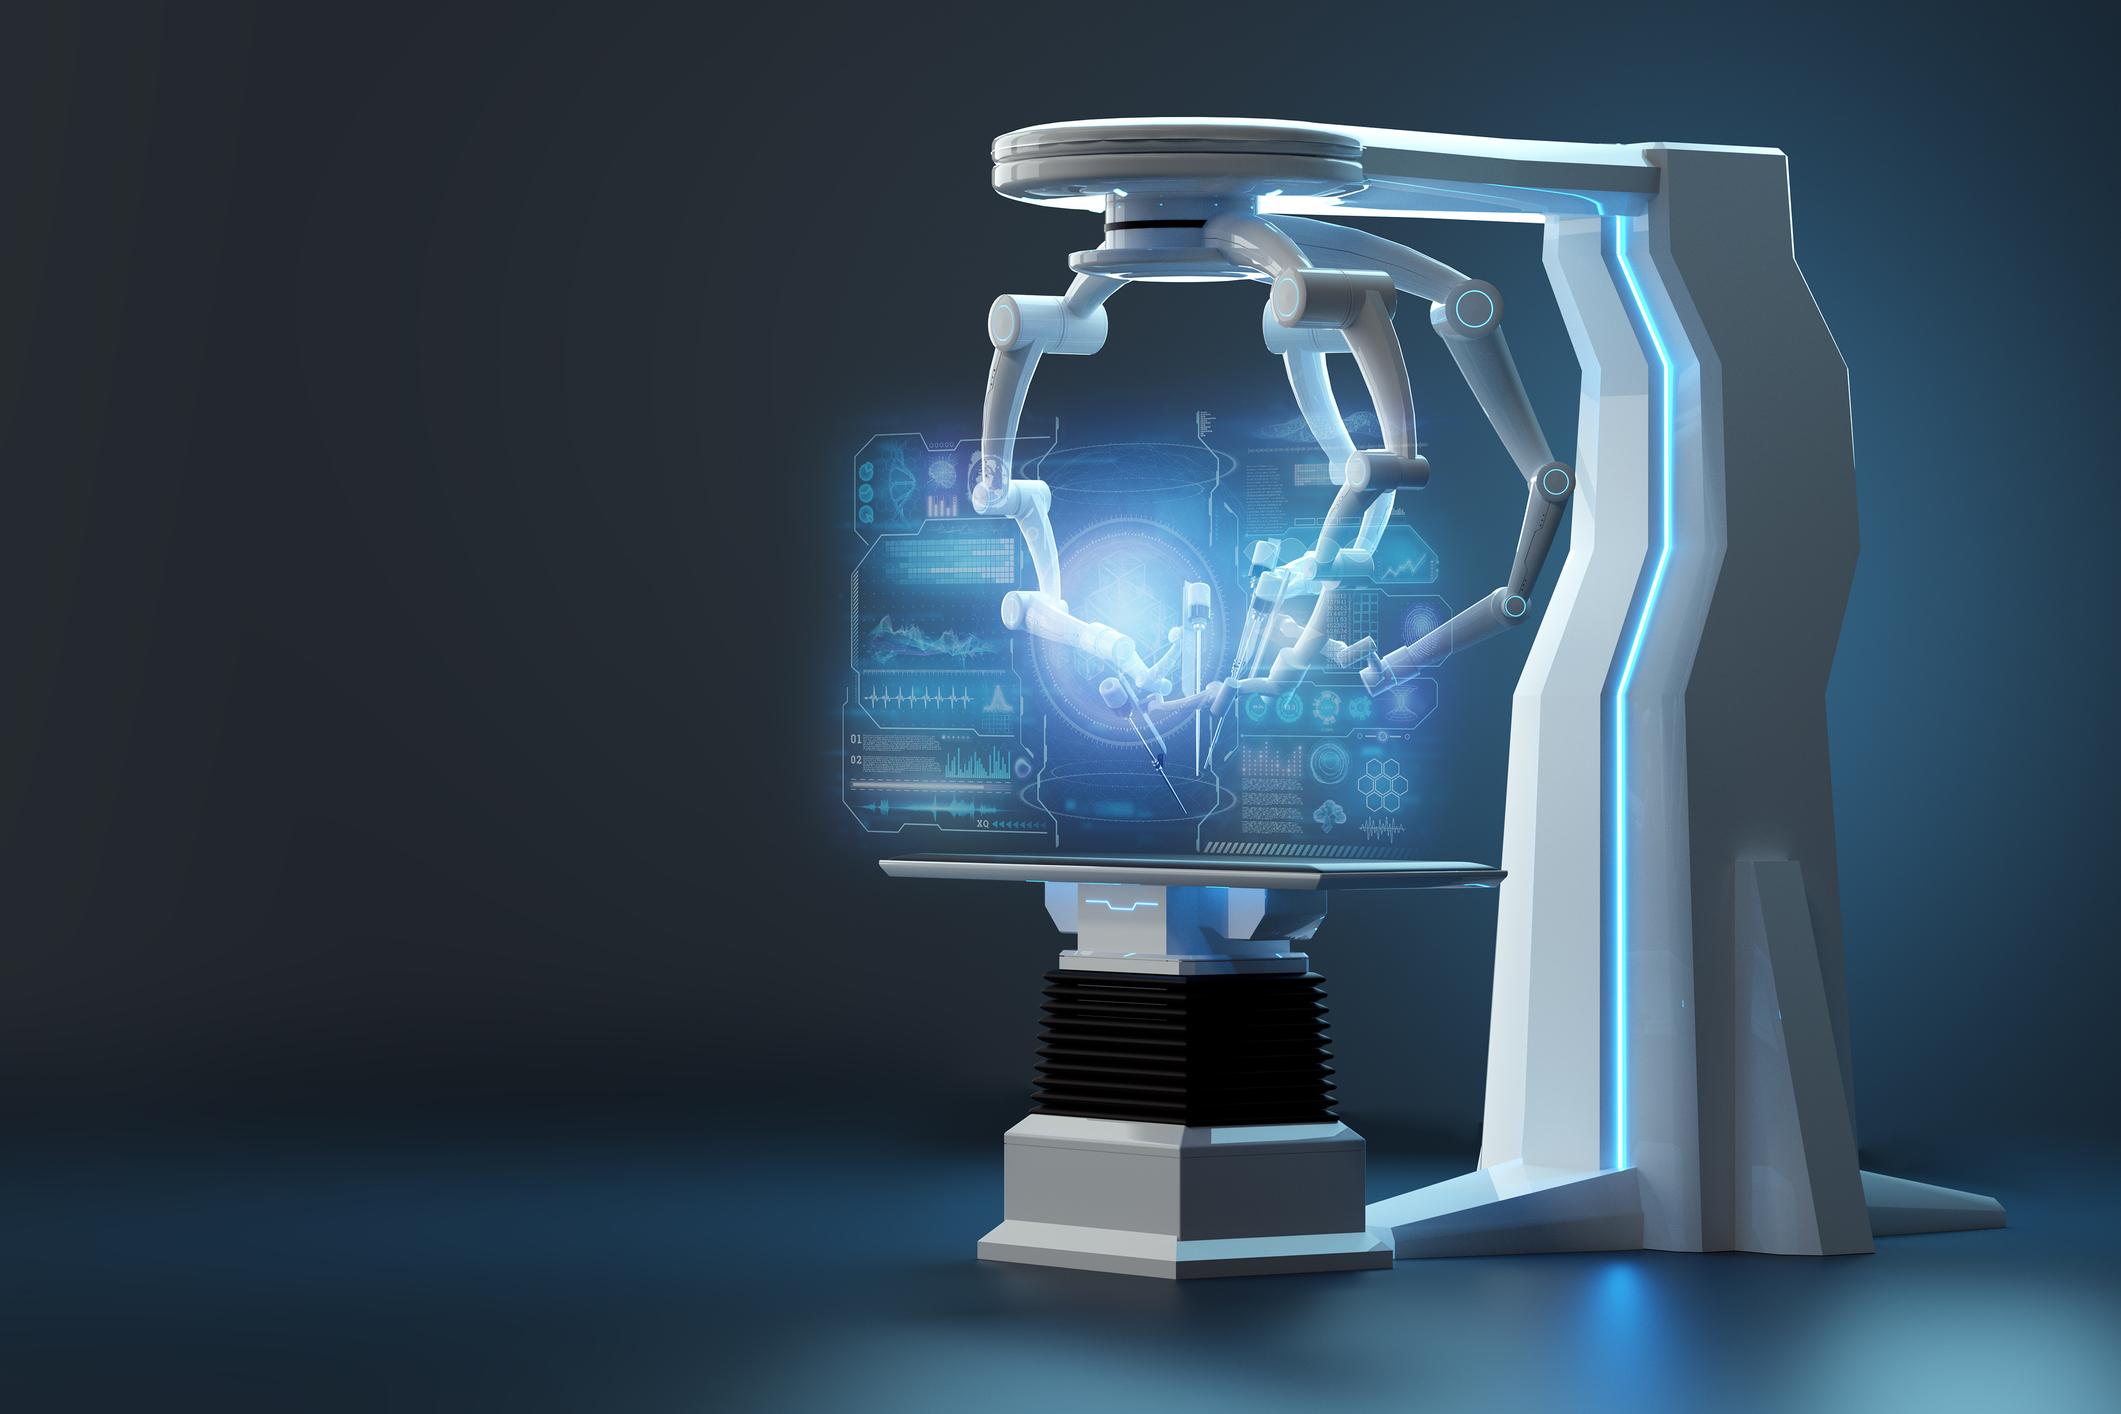 Powering Next-Generation Surgical Navigation